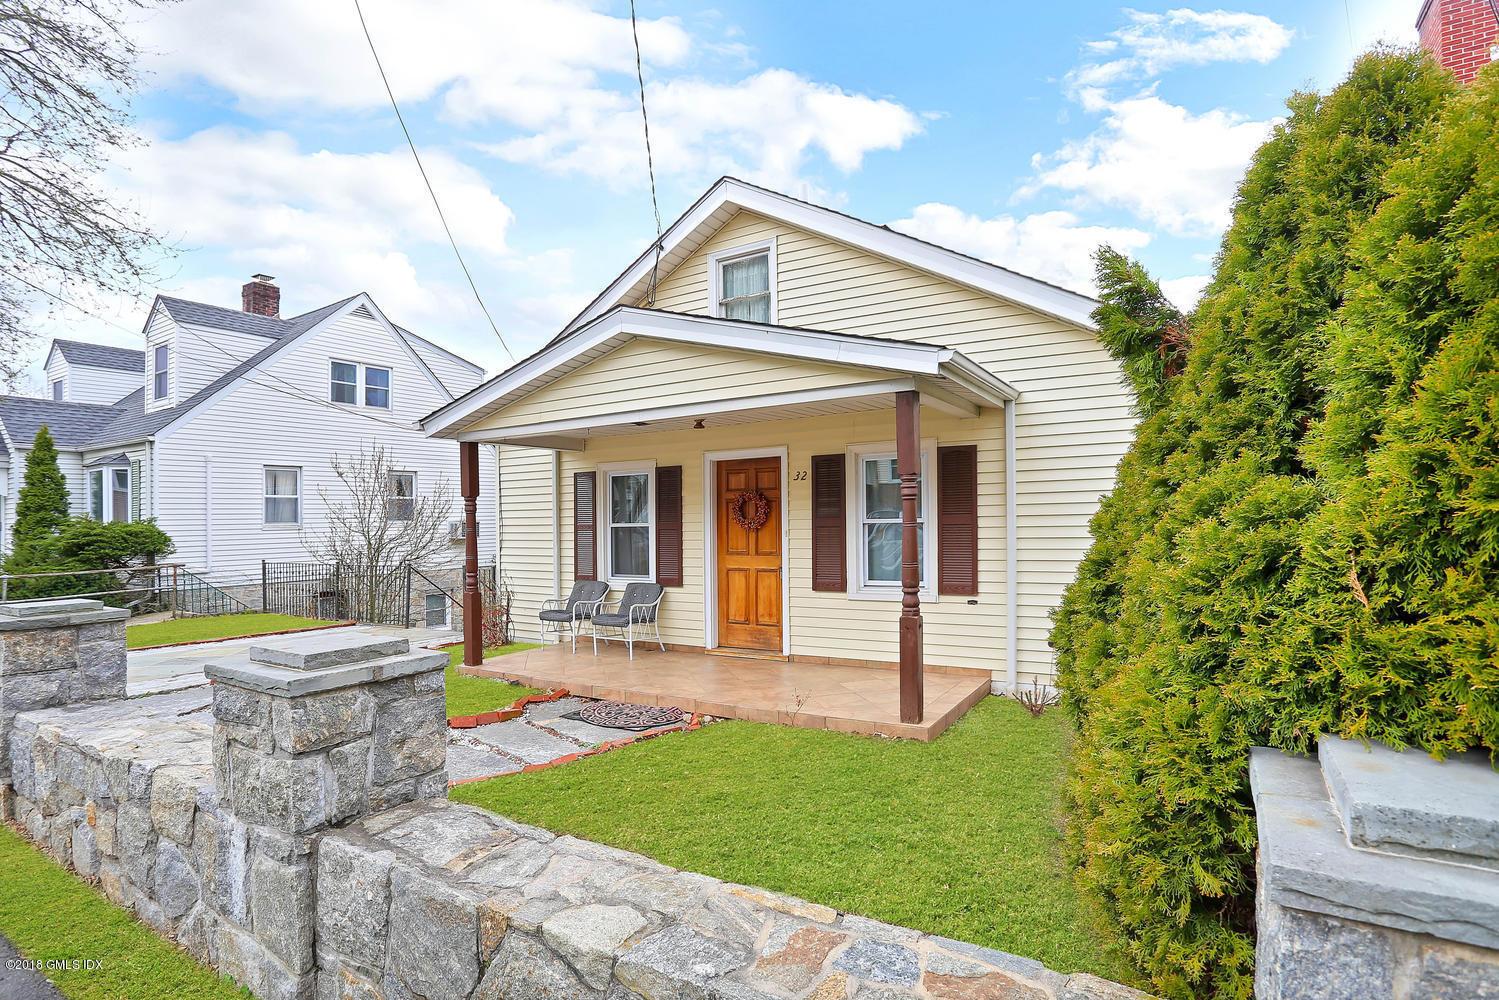 32 Pemberwick Road,Greenwich,Connecticut 06831,3 Bedrooms Bedrooms,2 BathroomsBathrooms,Single family,Pemberwick,104458